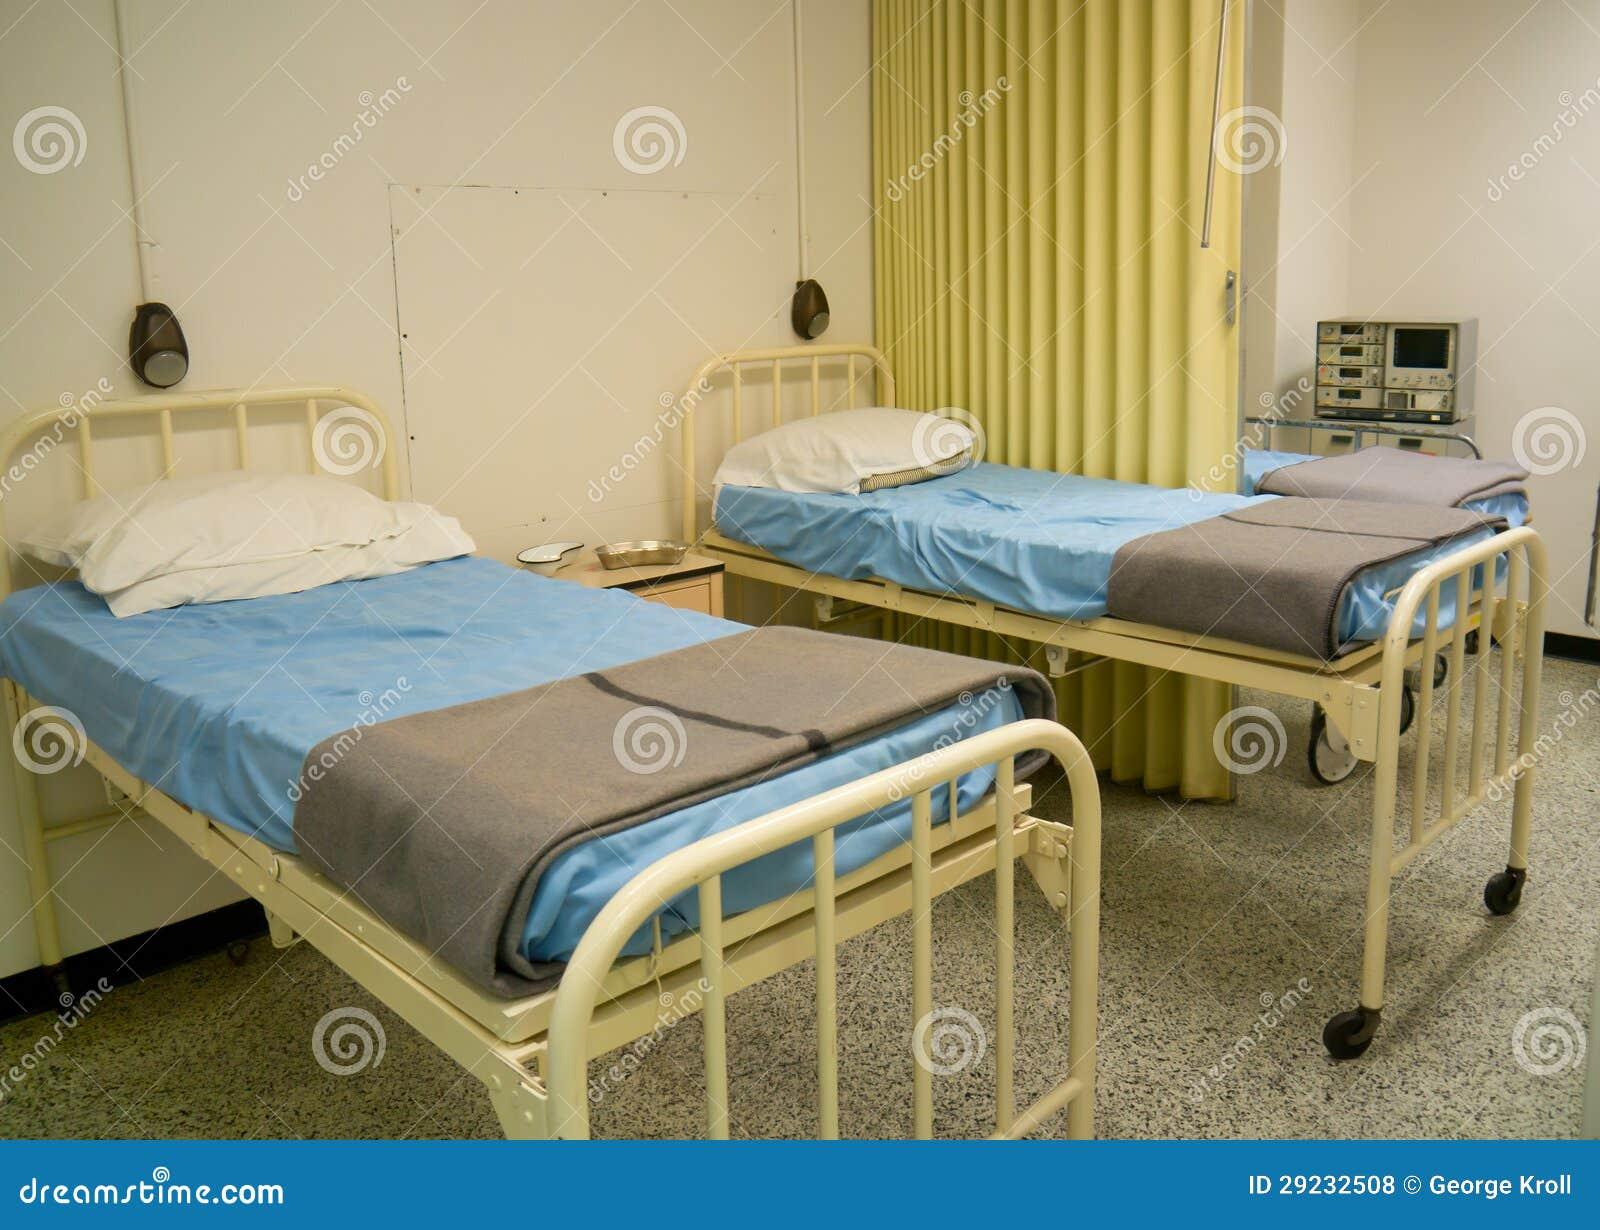 Download Camas De Hospital Militares Do Estilo Foto de Stock - Imagem de enfermaria, baía: 29232508